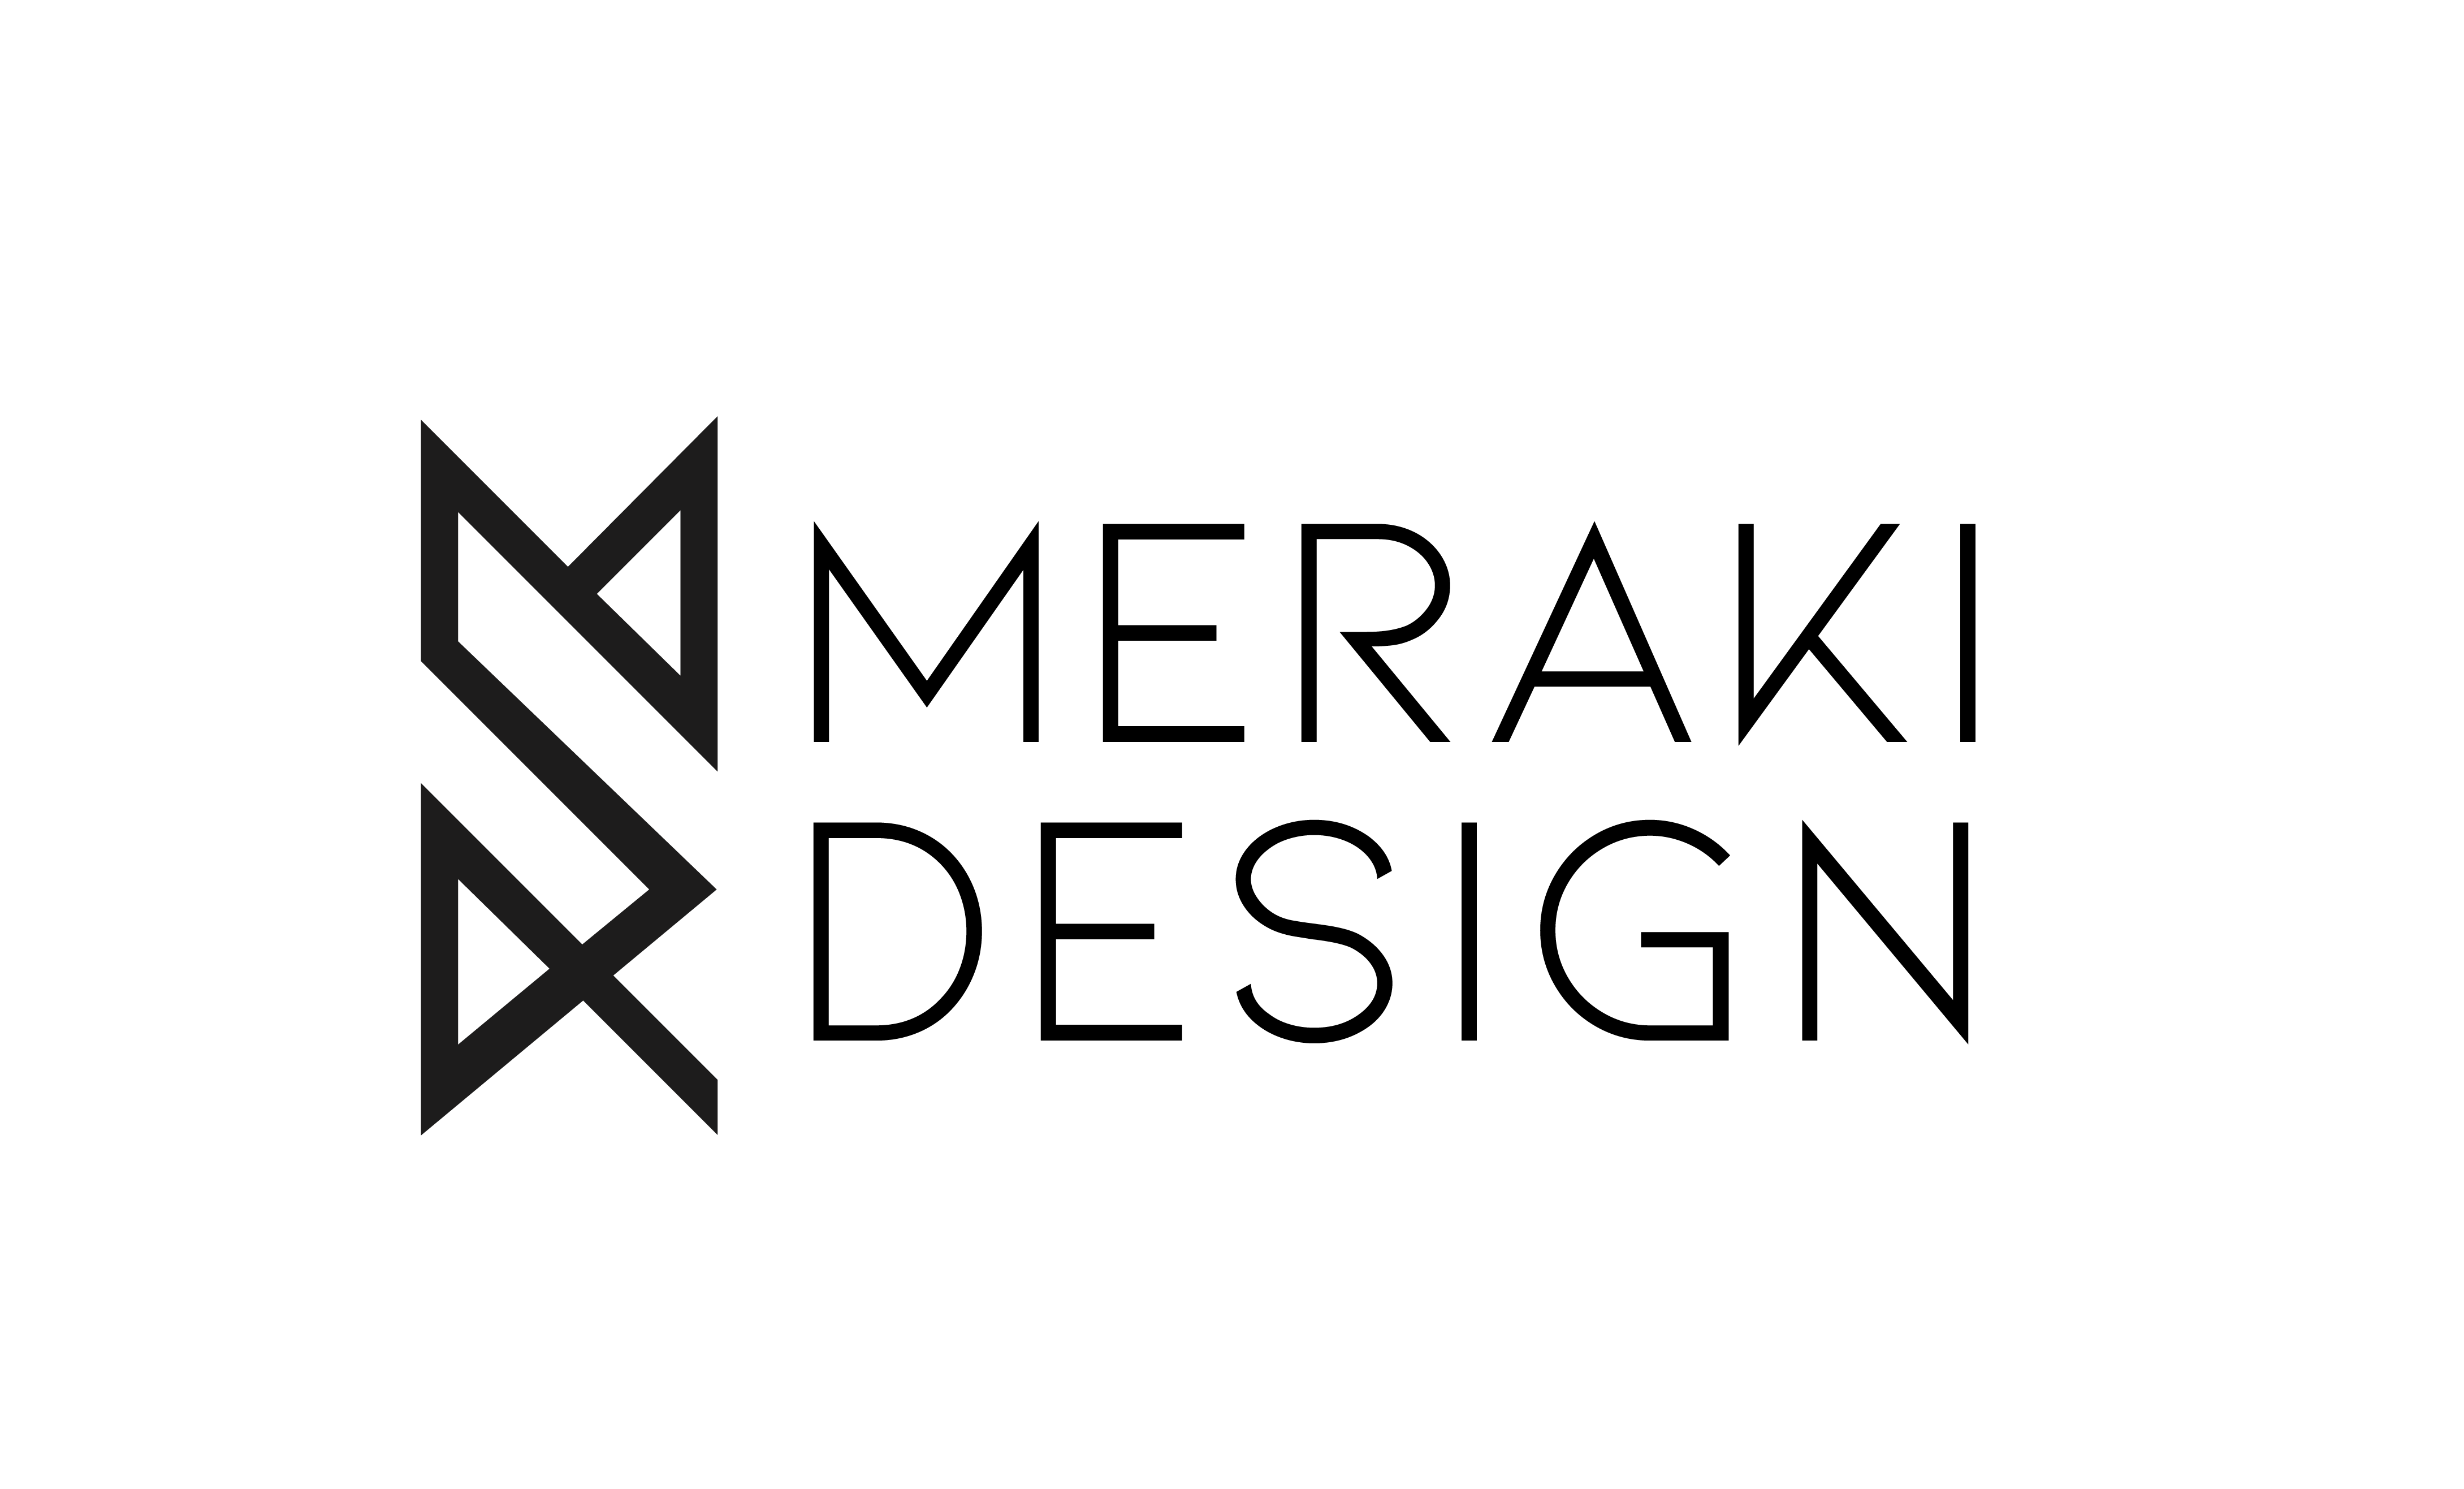 Graphic Design and Creative Services - Meraki Design